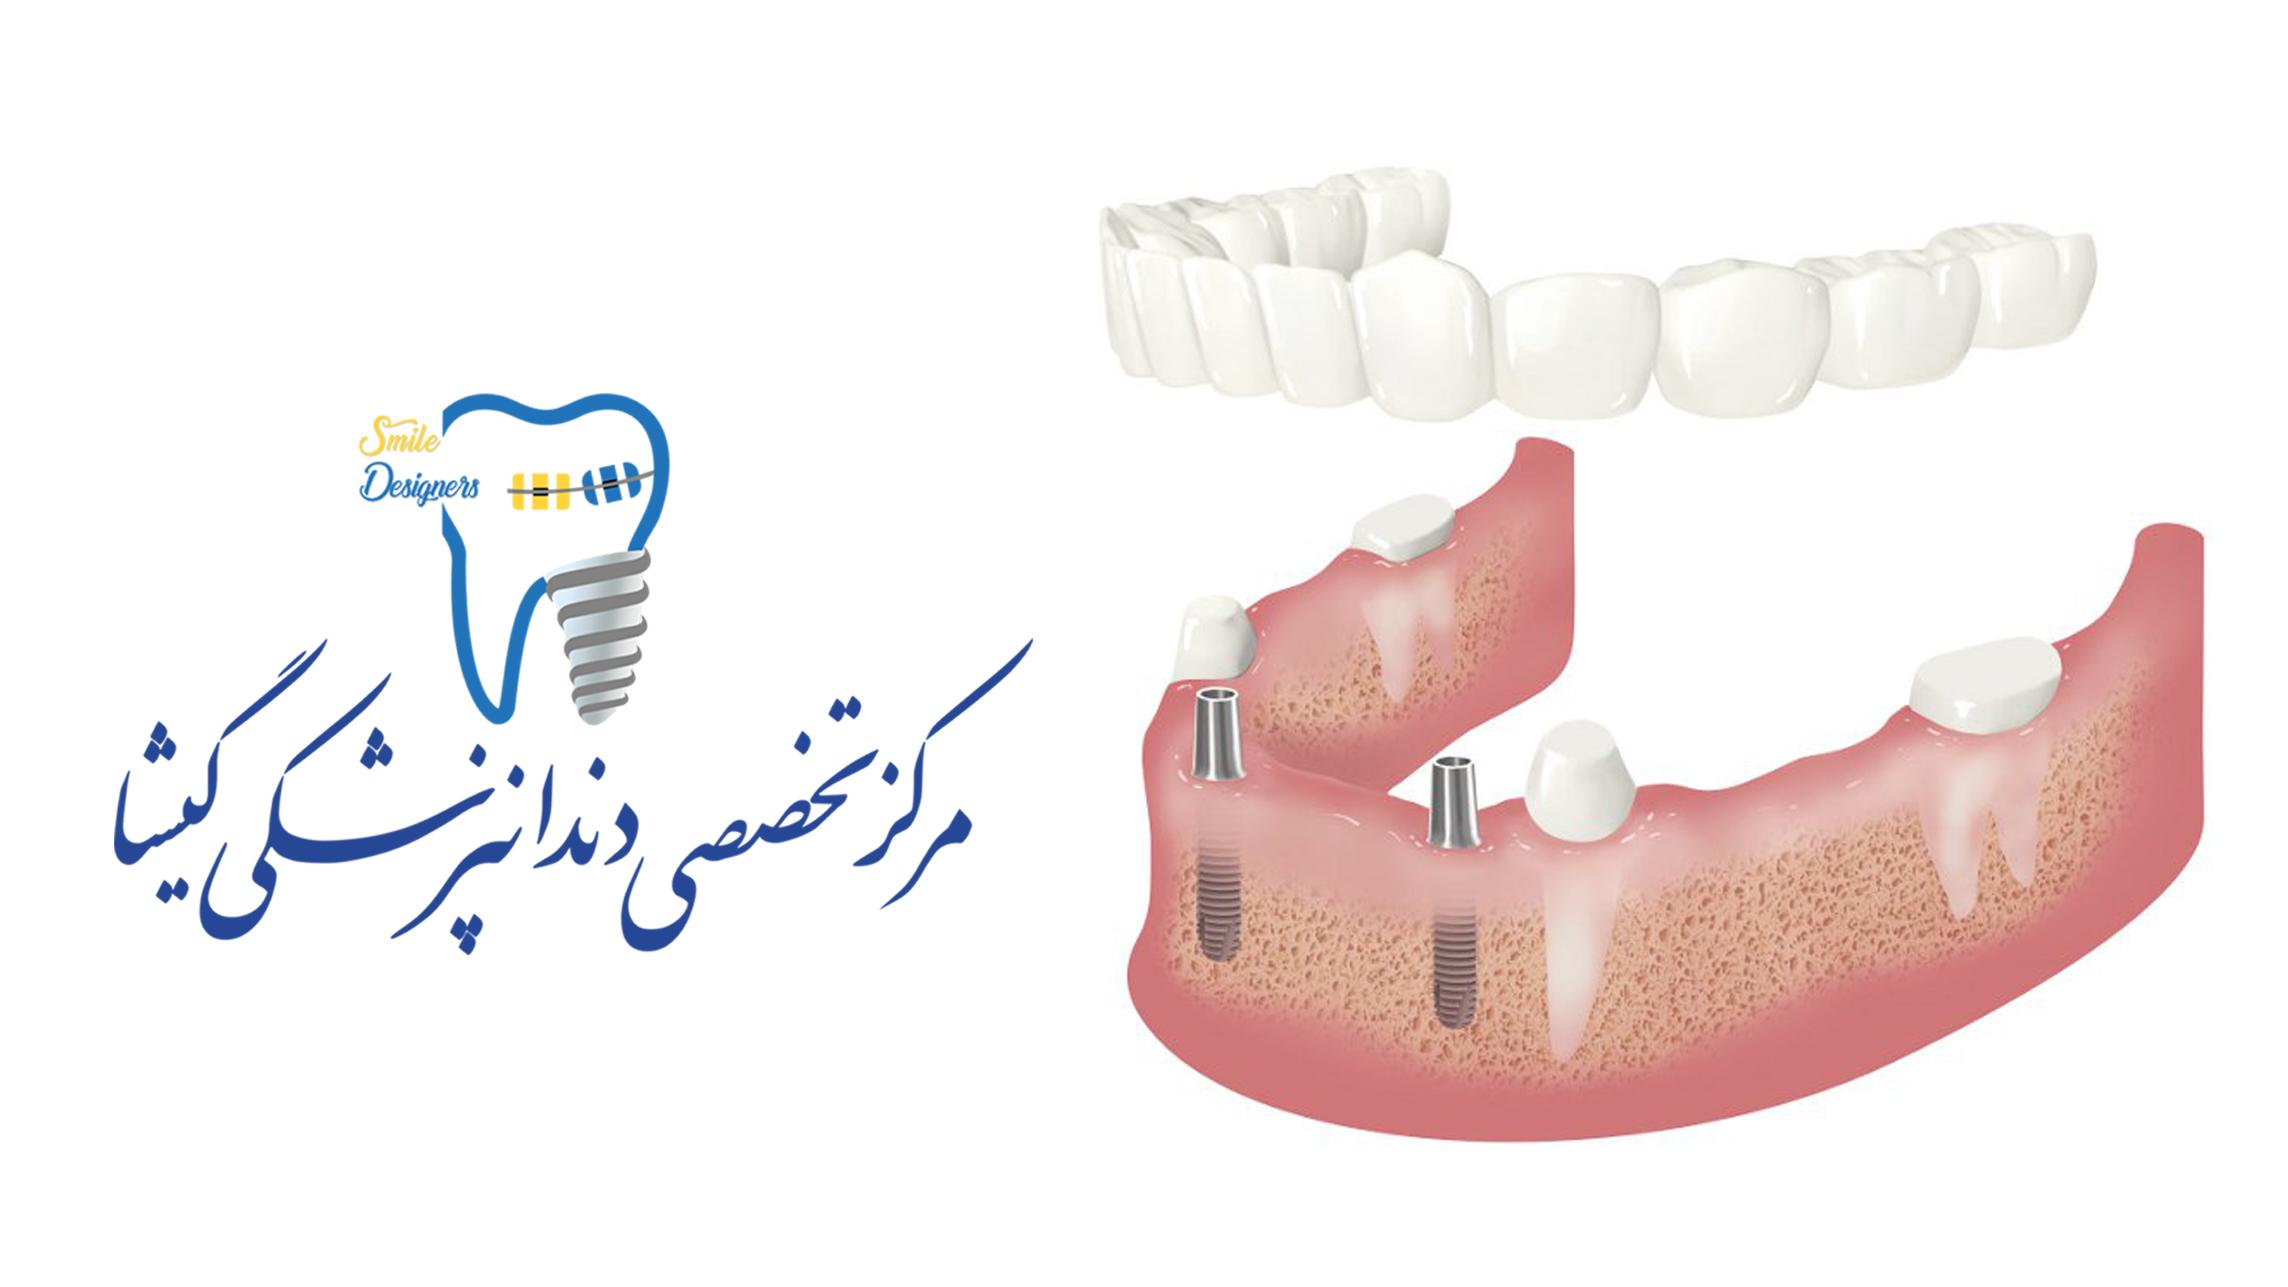 اوردنچر - ایمپلنت دندان